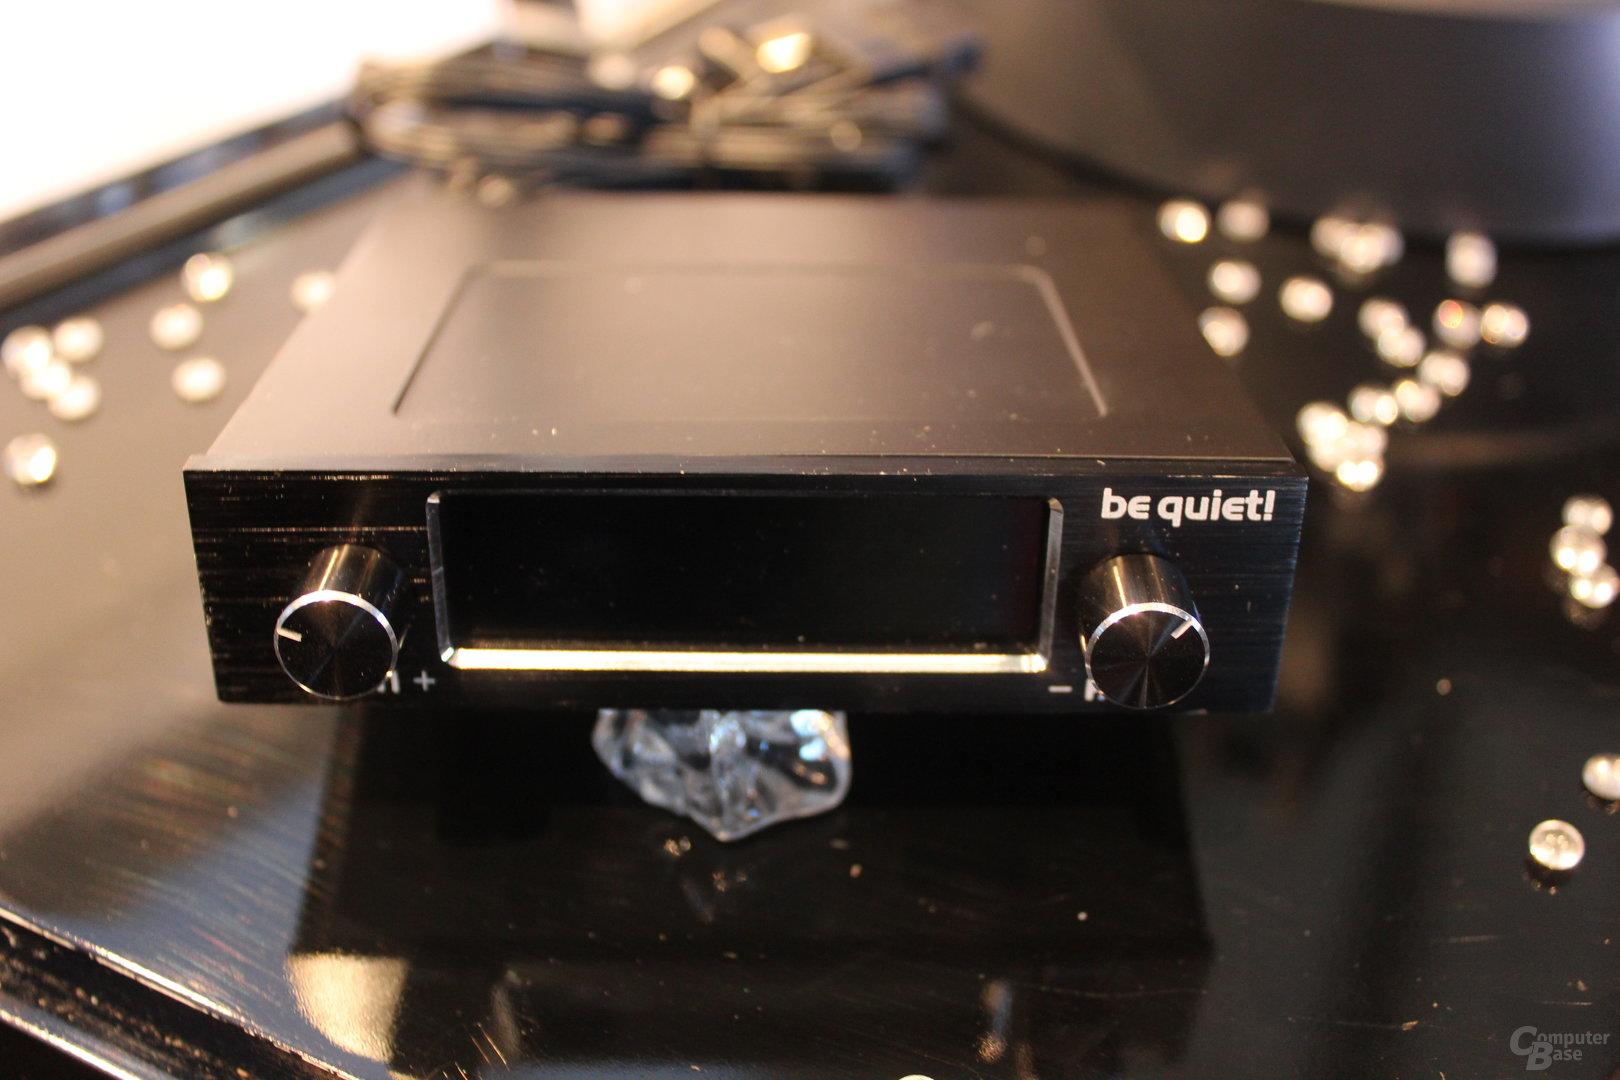 be quiet! Lüftersteuerung II